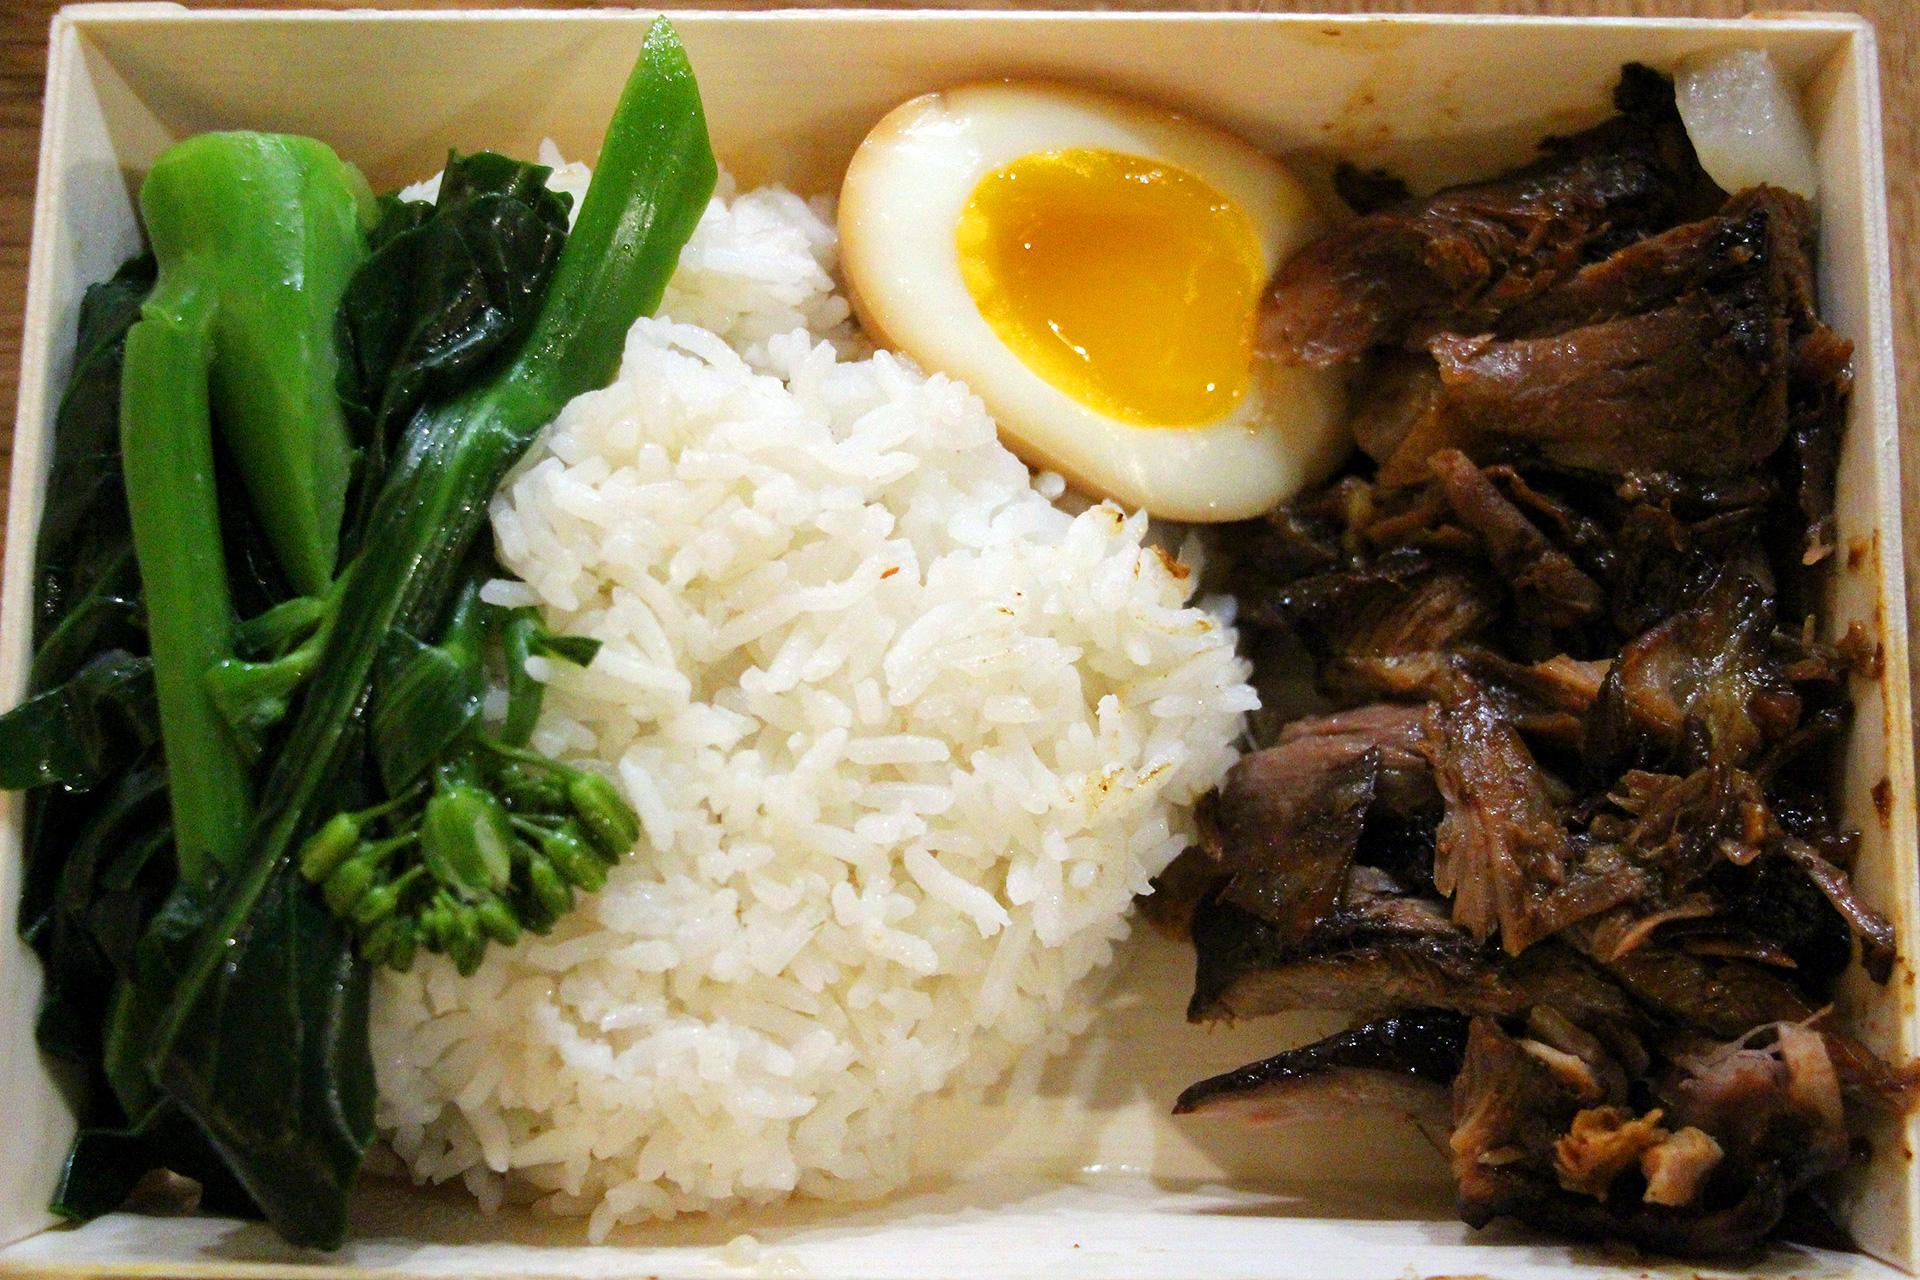 Braised Pork - Khao Kha Moo - with Egg & Greens with Jasmine Rice